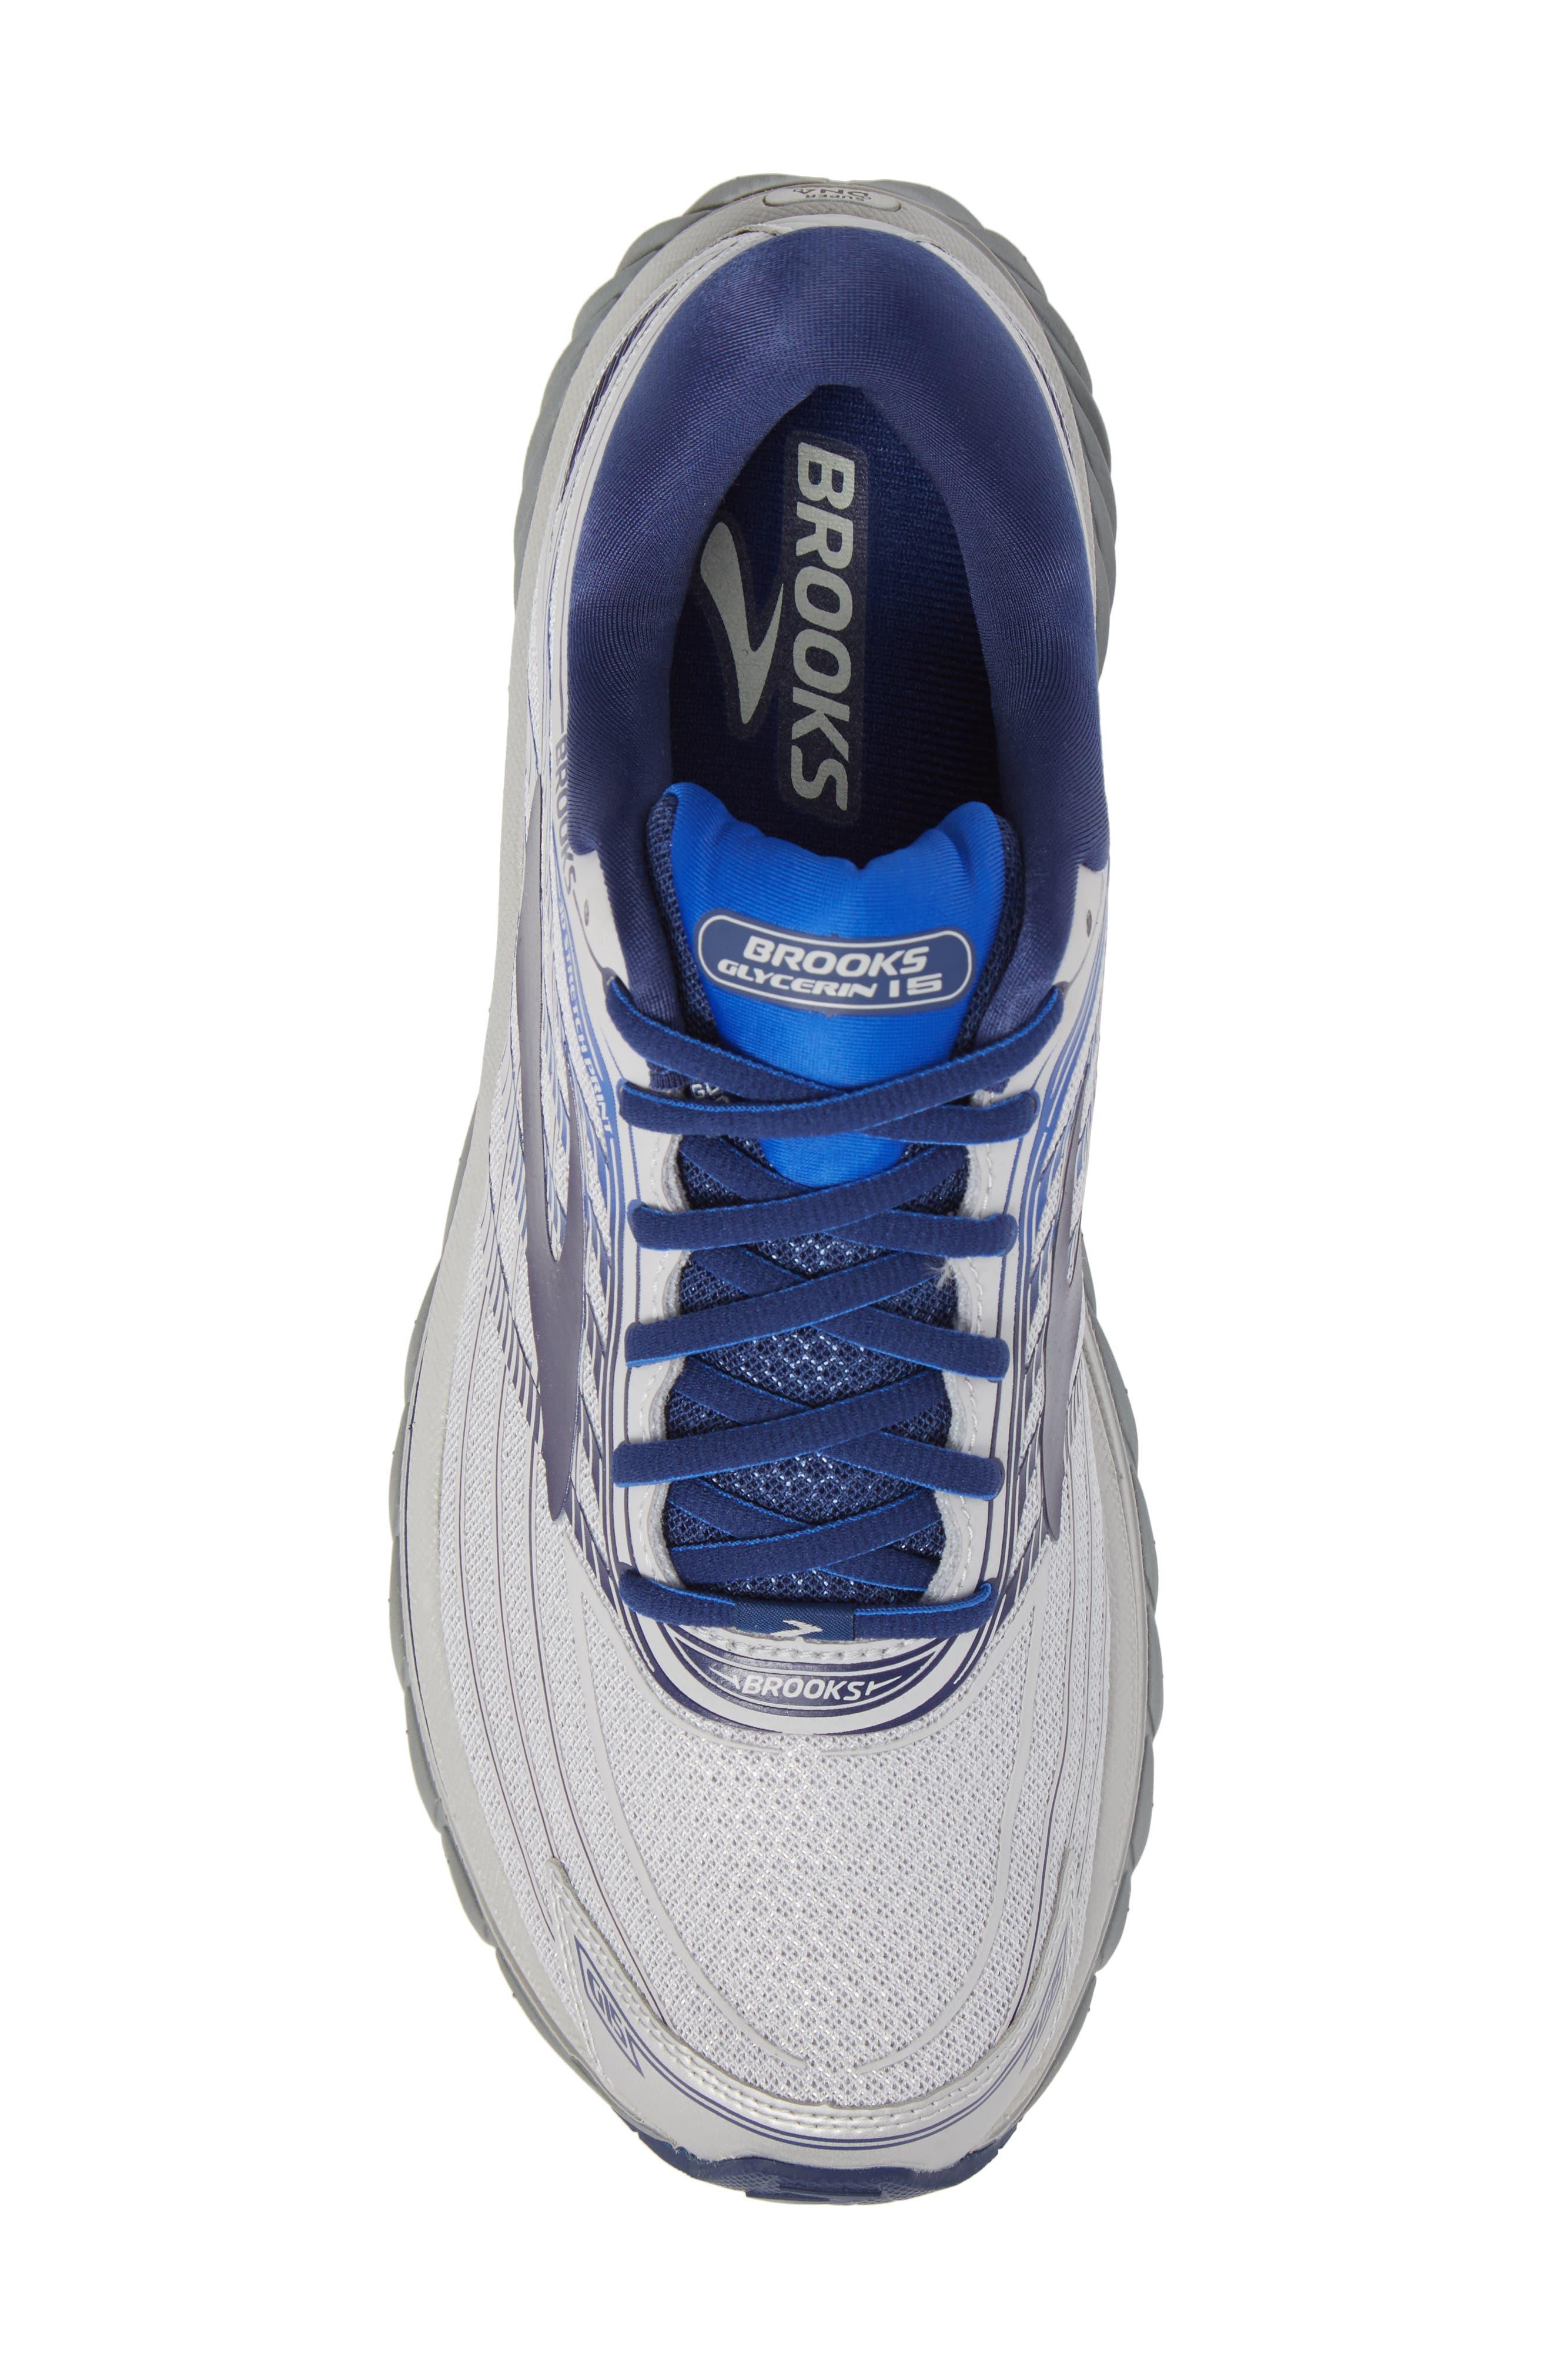 Glycerin 15 Running Shoe,                             Alternate thumbnail 5, color,                             Silver/ Navy/ Blue